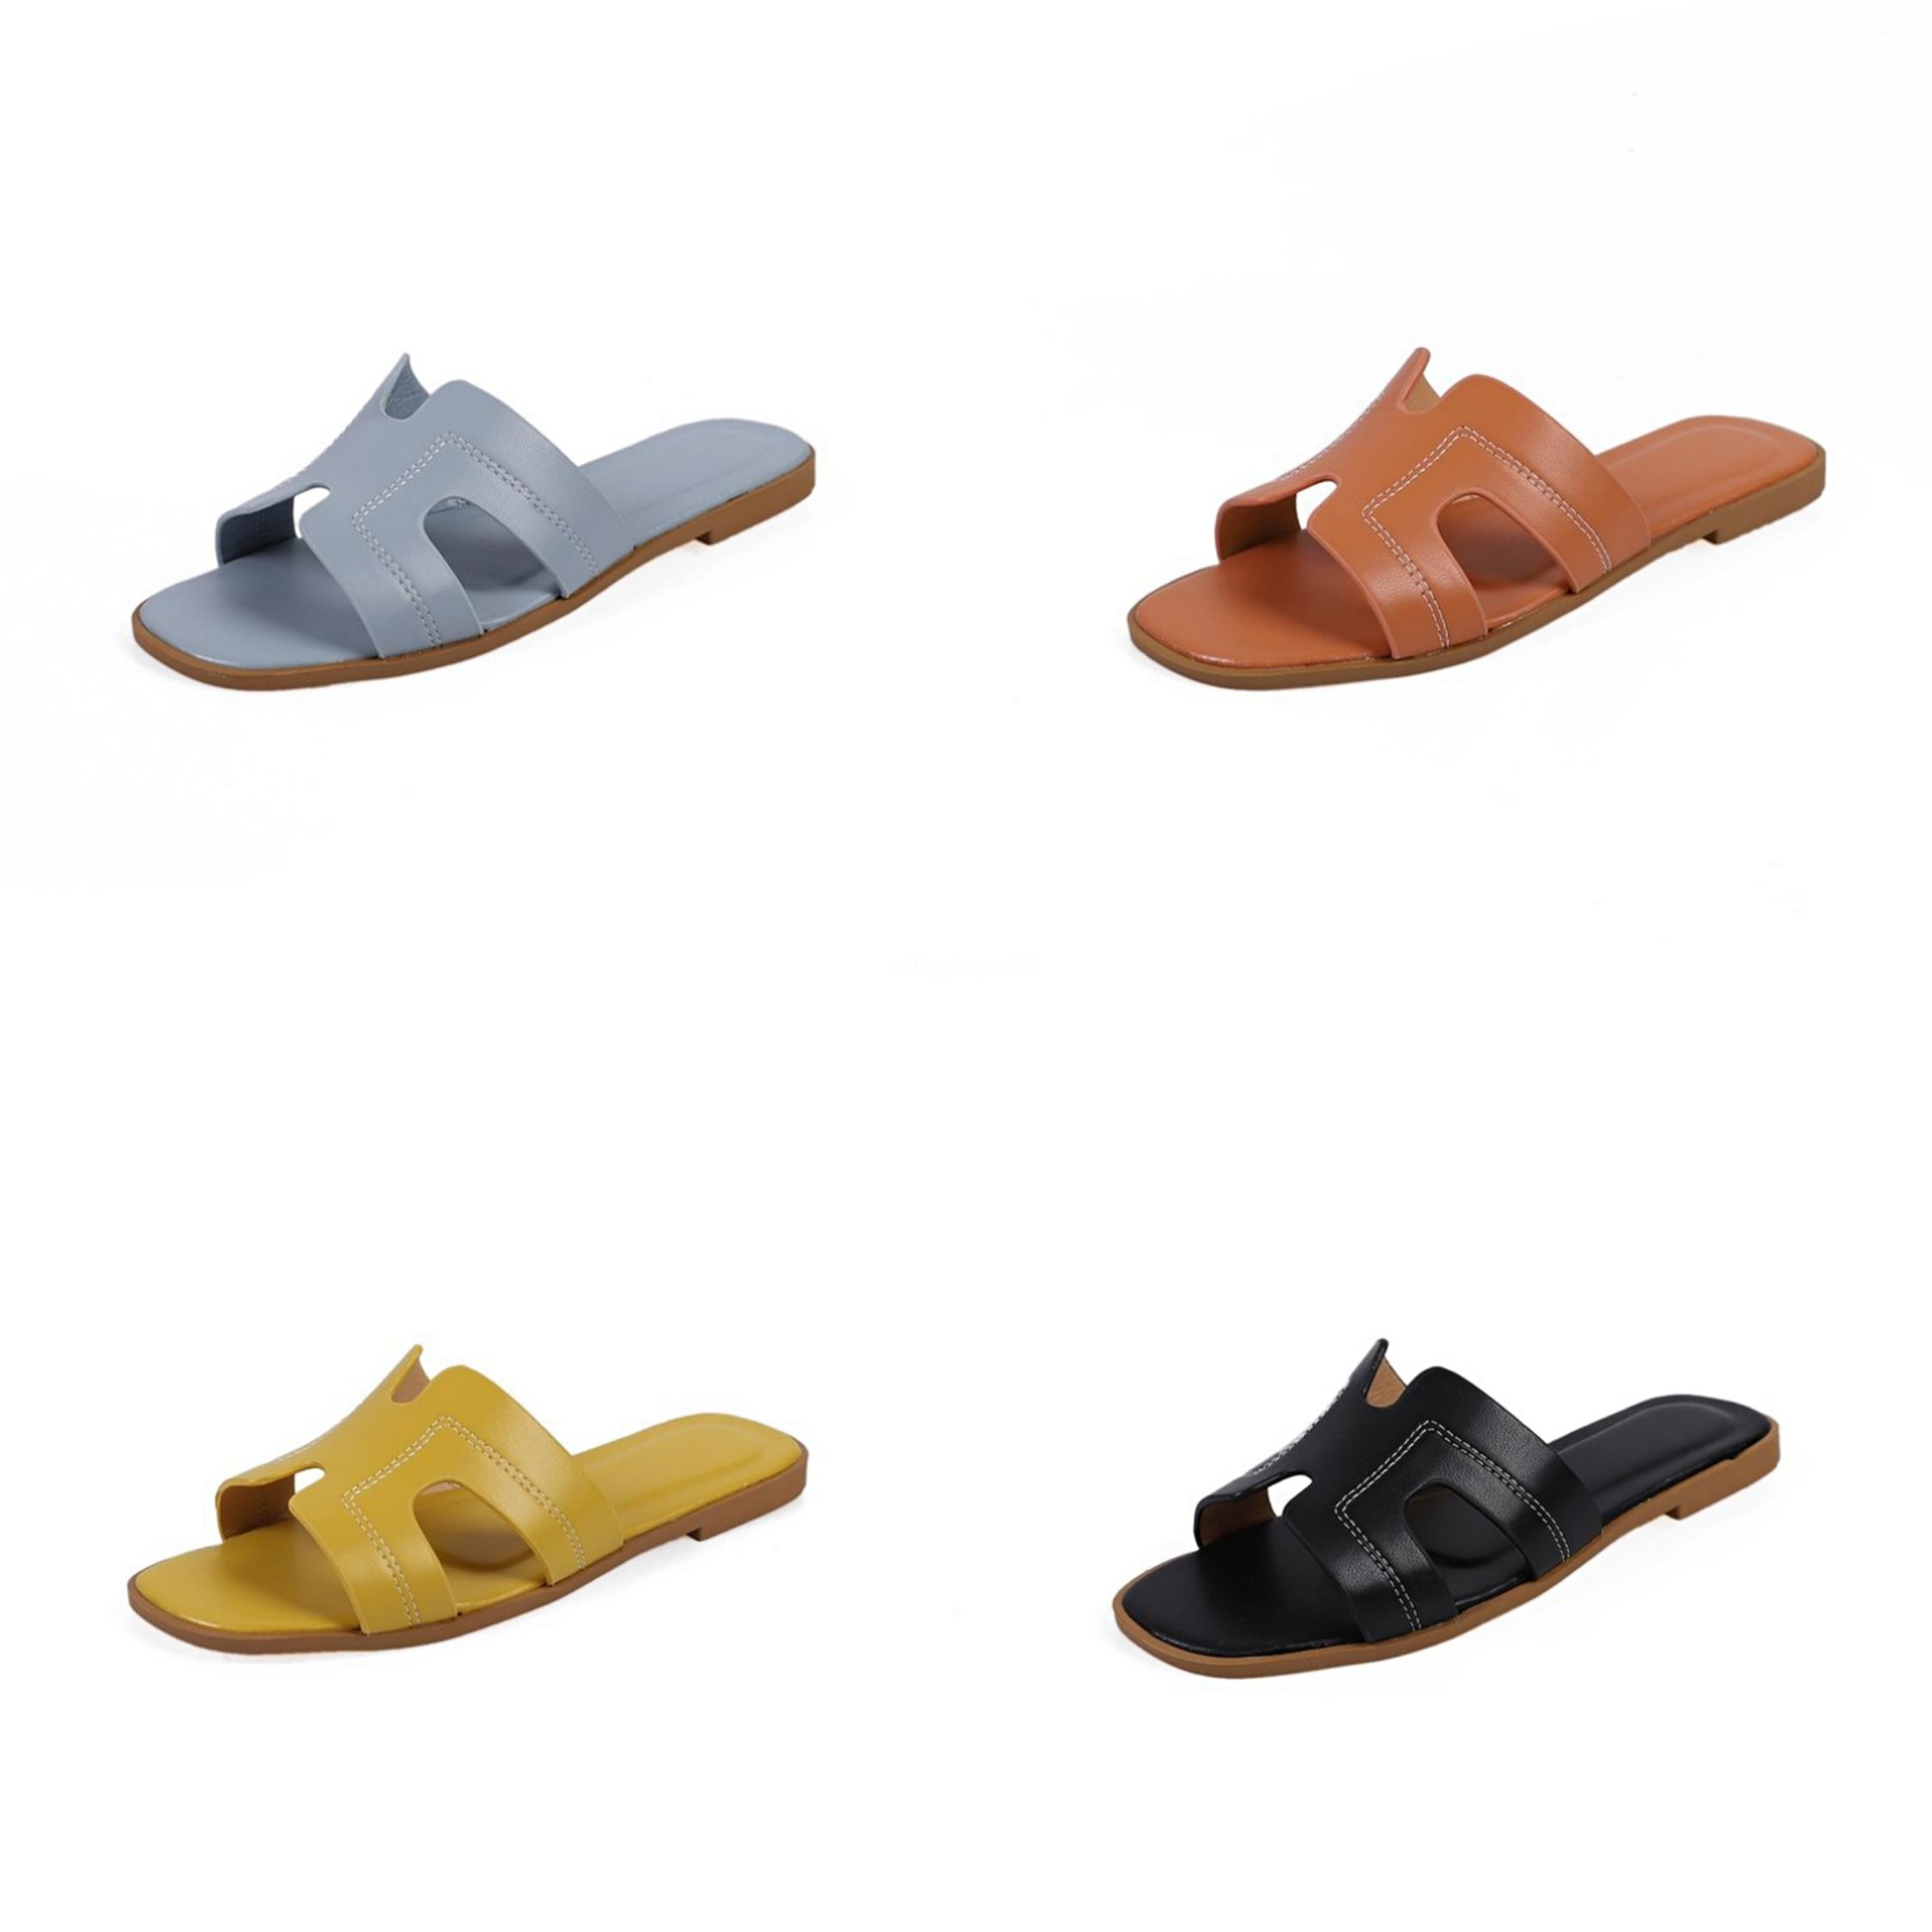 Sialia الرياضة النعال للبنين أحذية بنات النعال الصيف الشاطئ المفتوح تو مدرسة الأحذية لمكافحة زلق HookLoop المطاط 2020 # 434